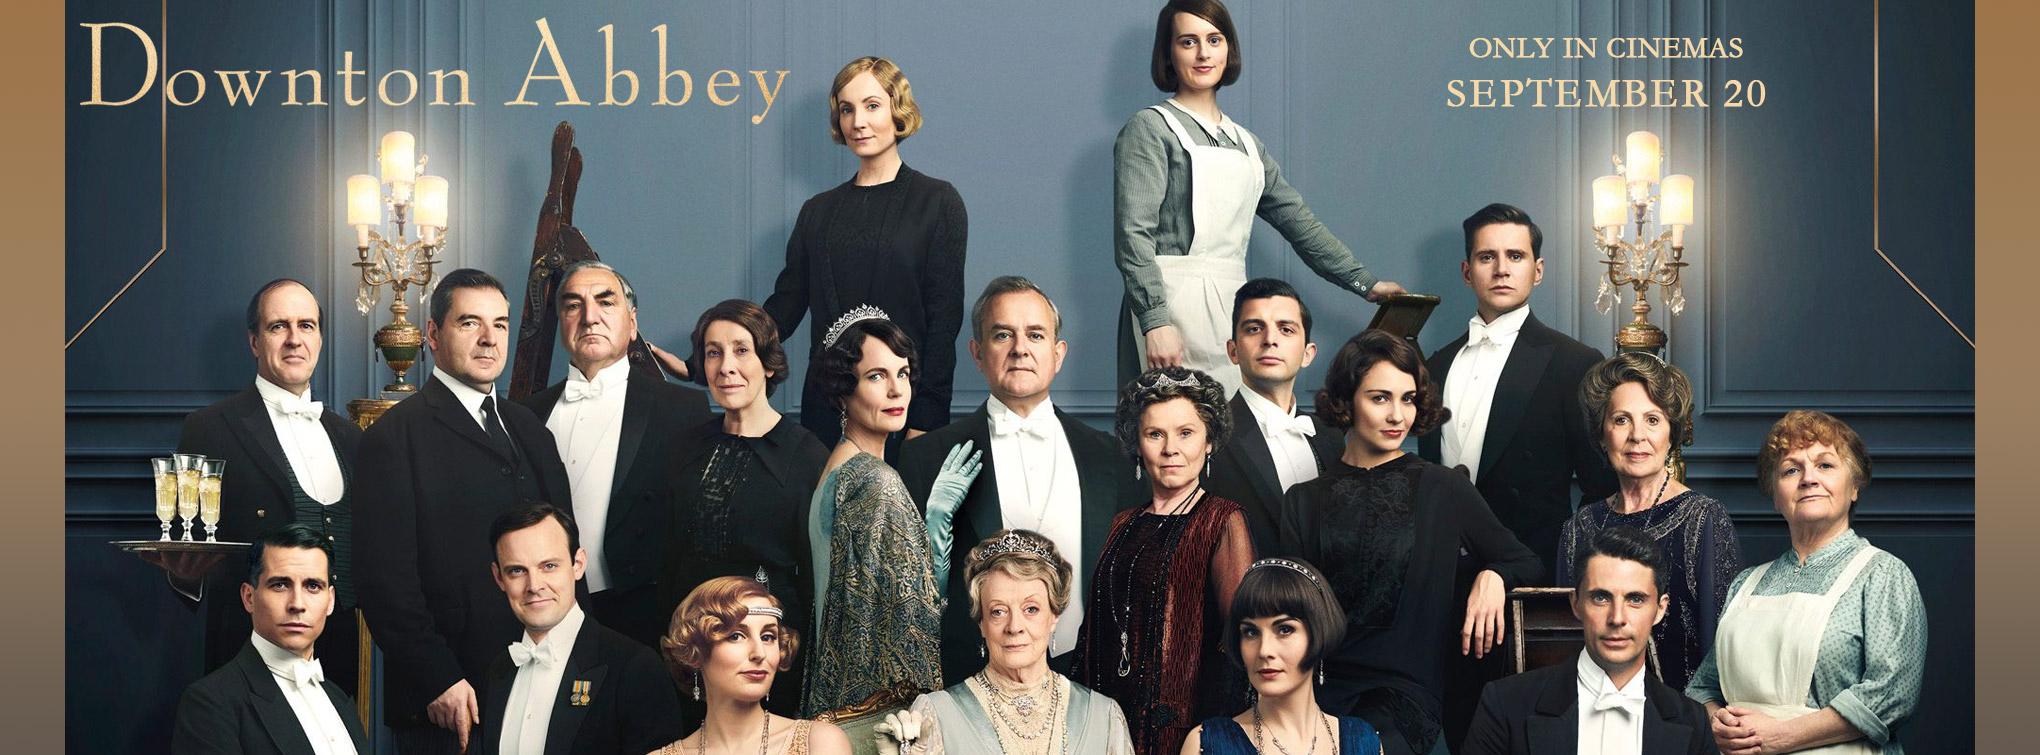 Slider image for Downton Abbey